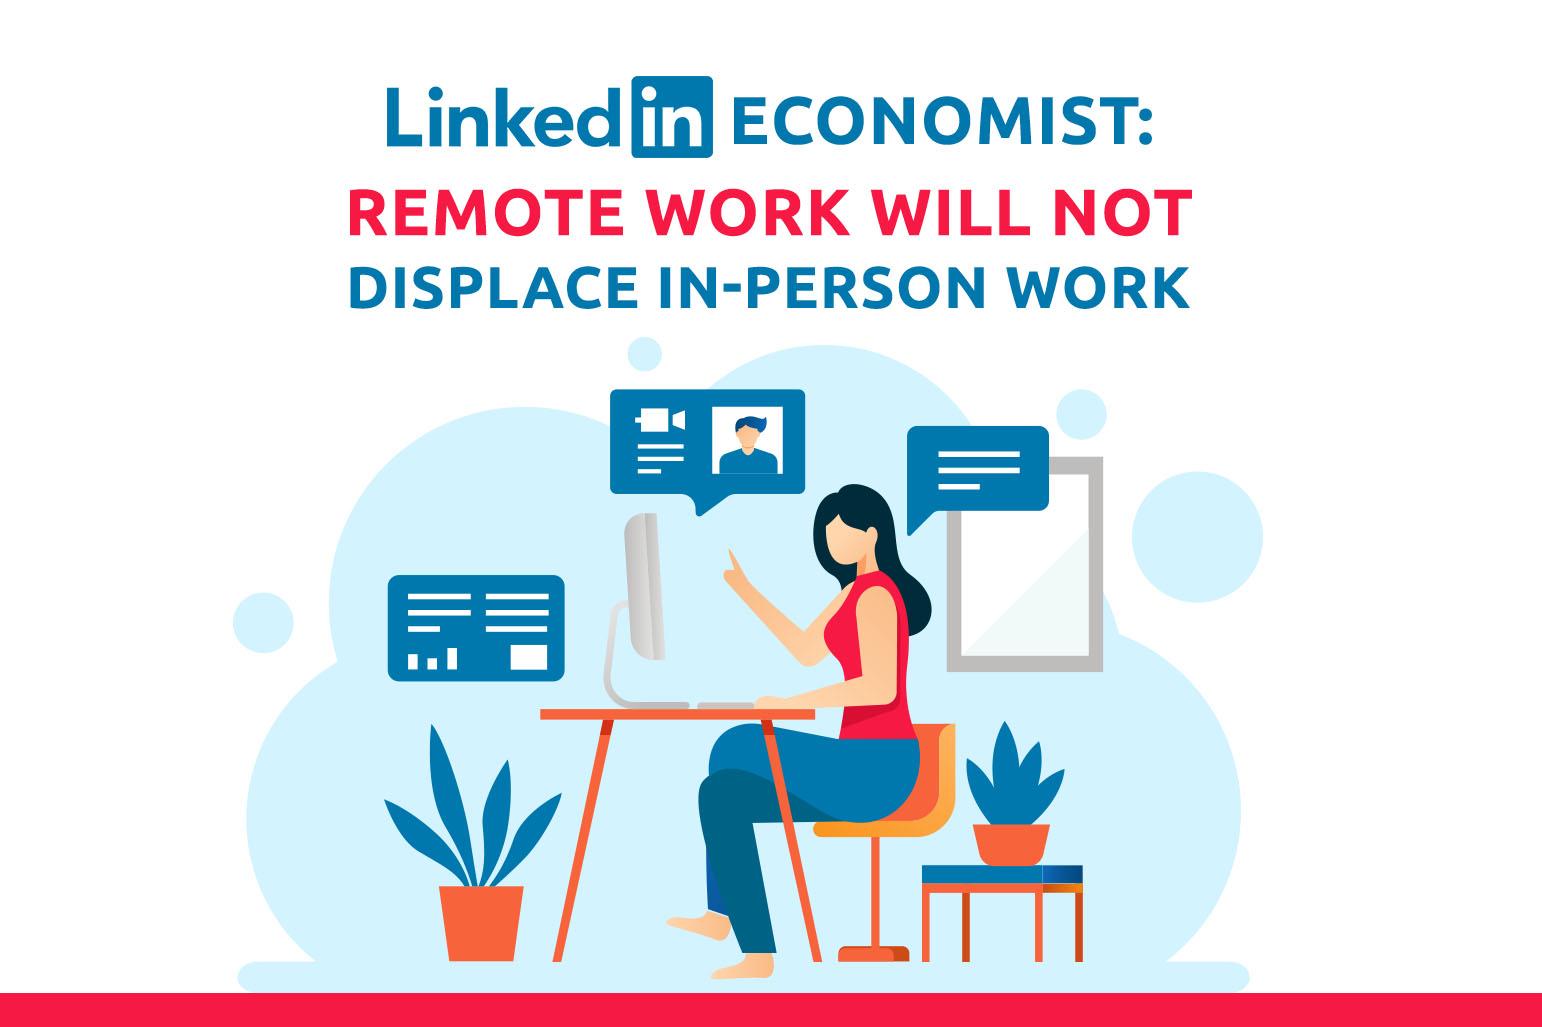 LinkedIn经济学家。远程工作不会取代面对面工作